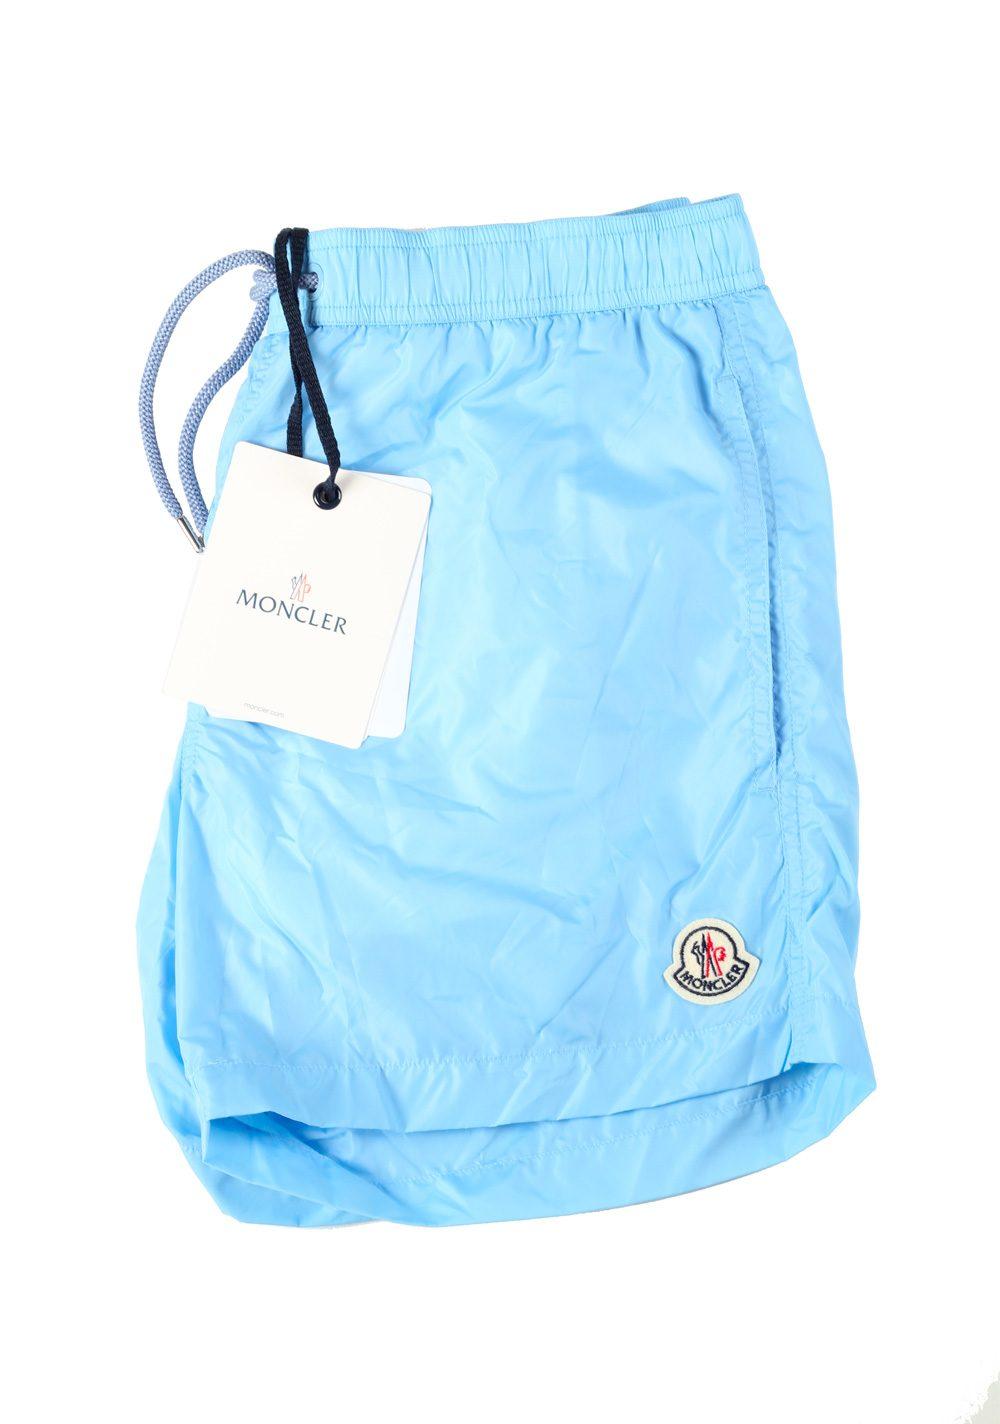 moncler blue swim shorts